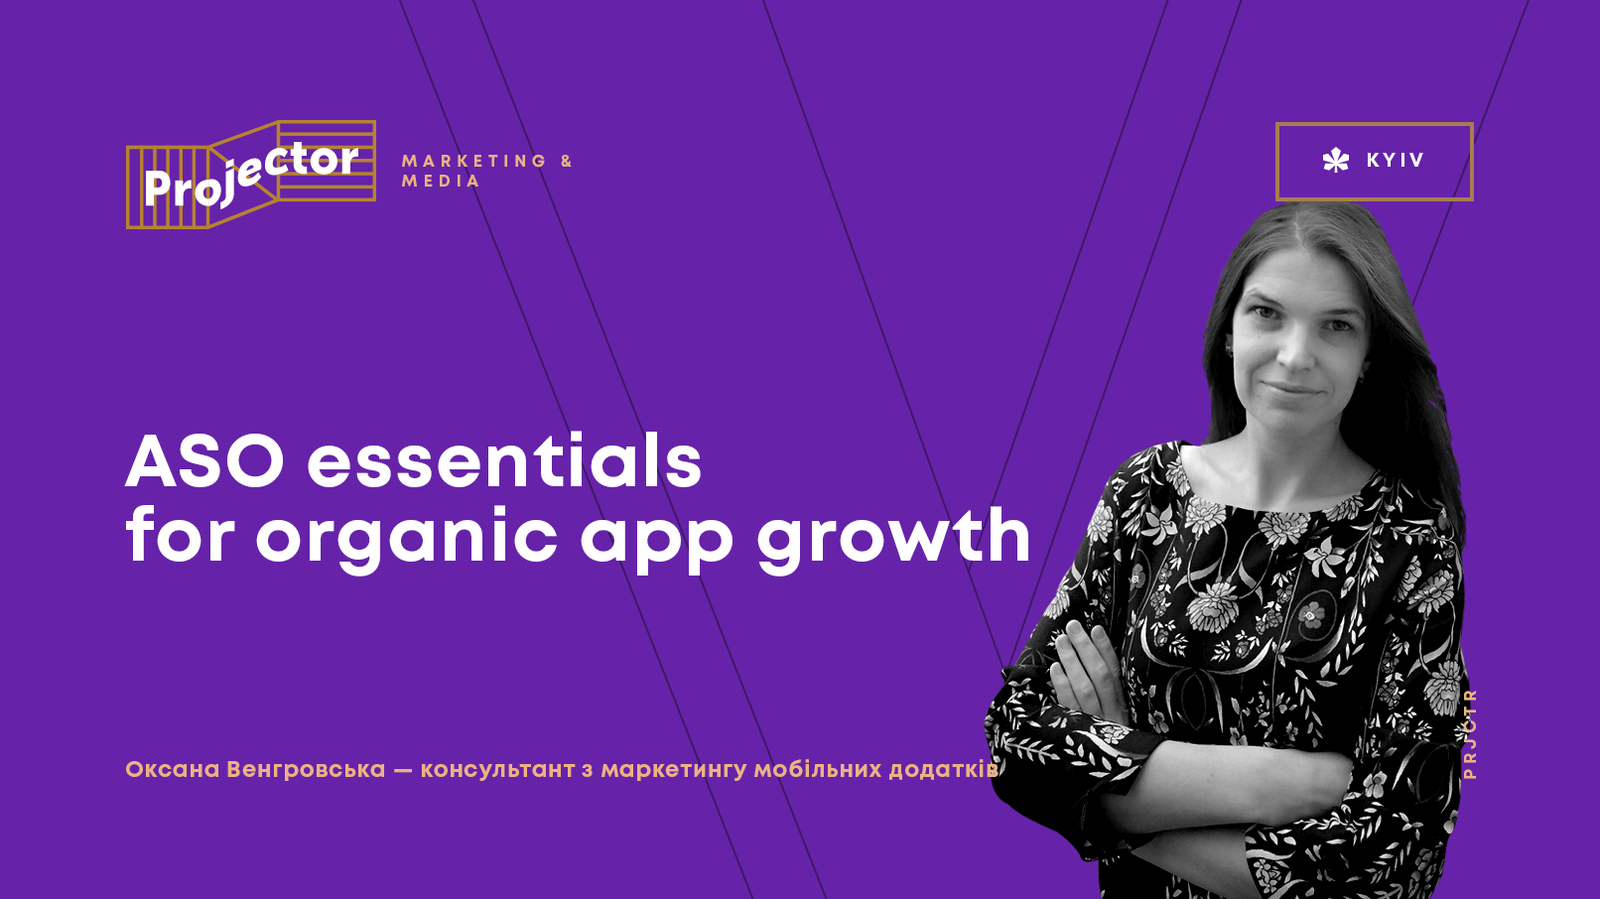 ASO ESSENTIALS FOR ORGANIC APP GROWTH